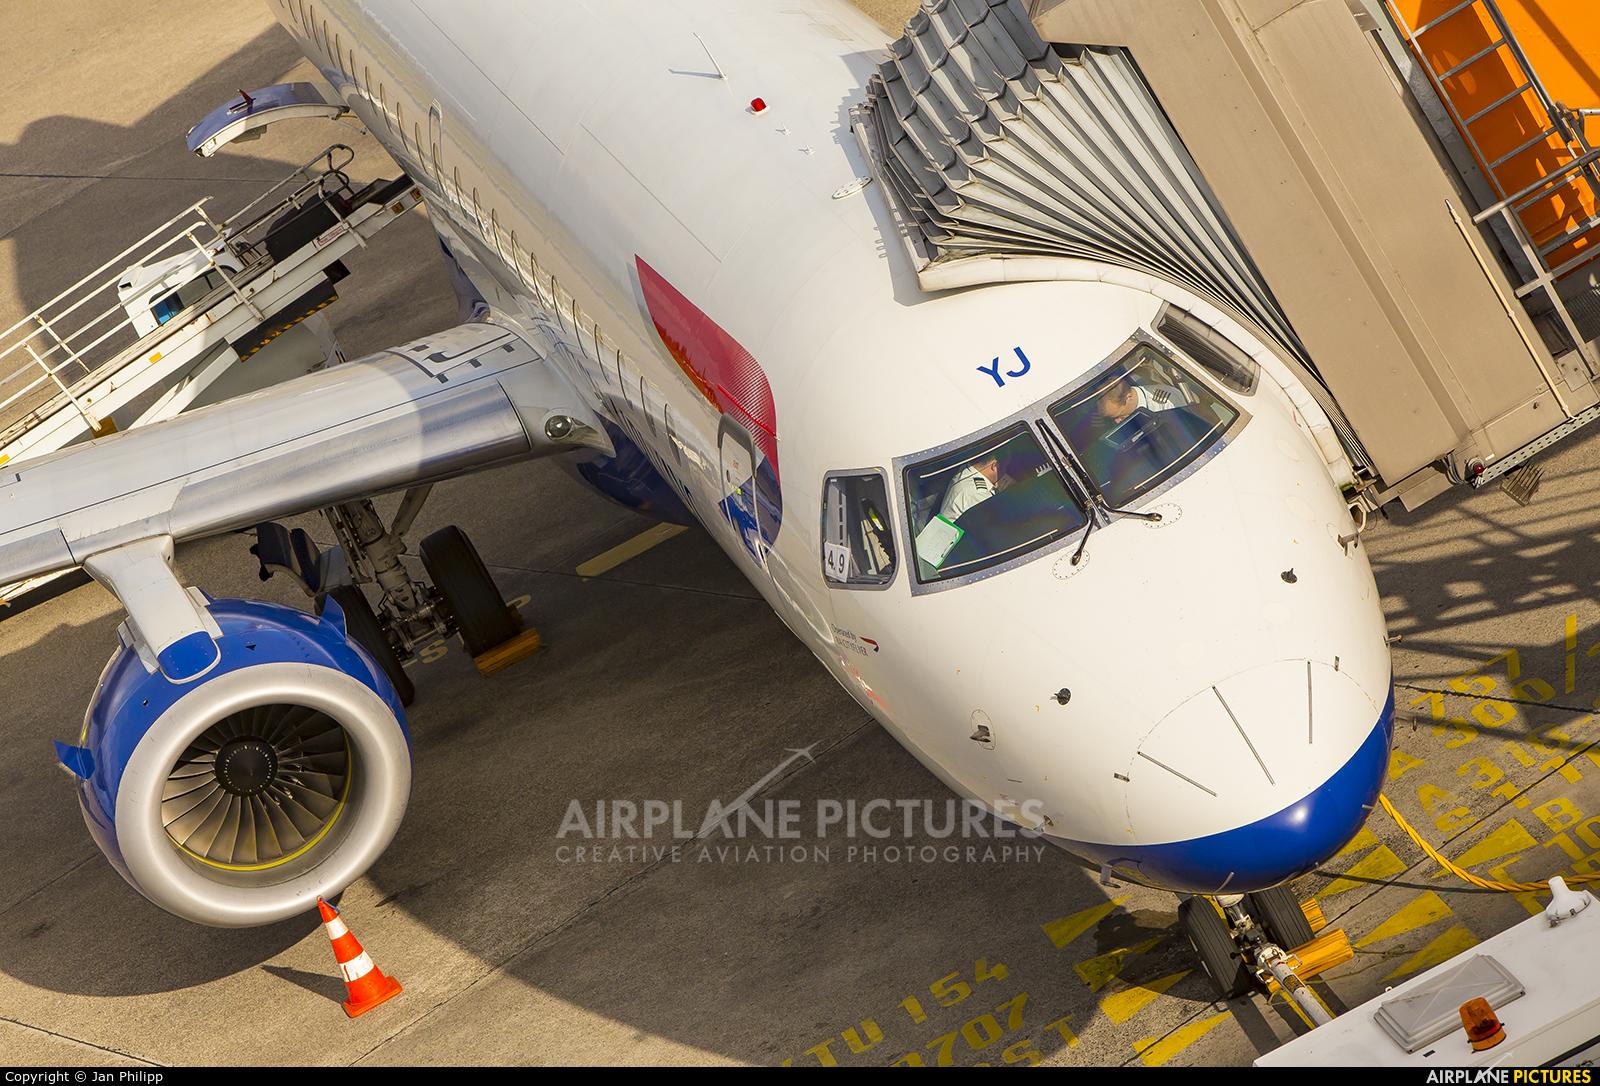 British Airways - City Flyer G-LCYJ aircraft at Berlin - Tegel